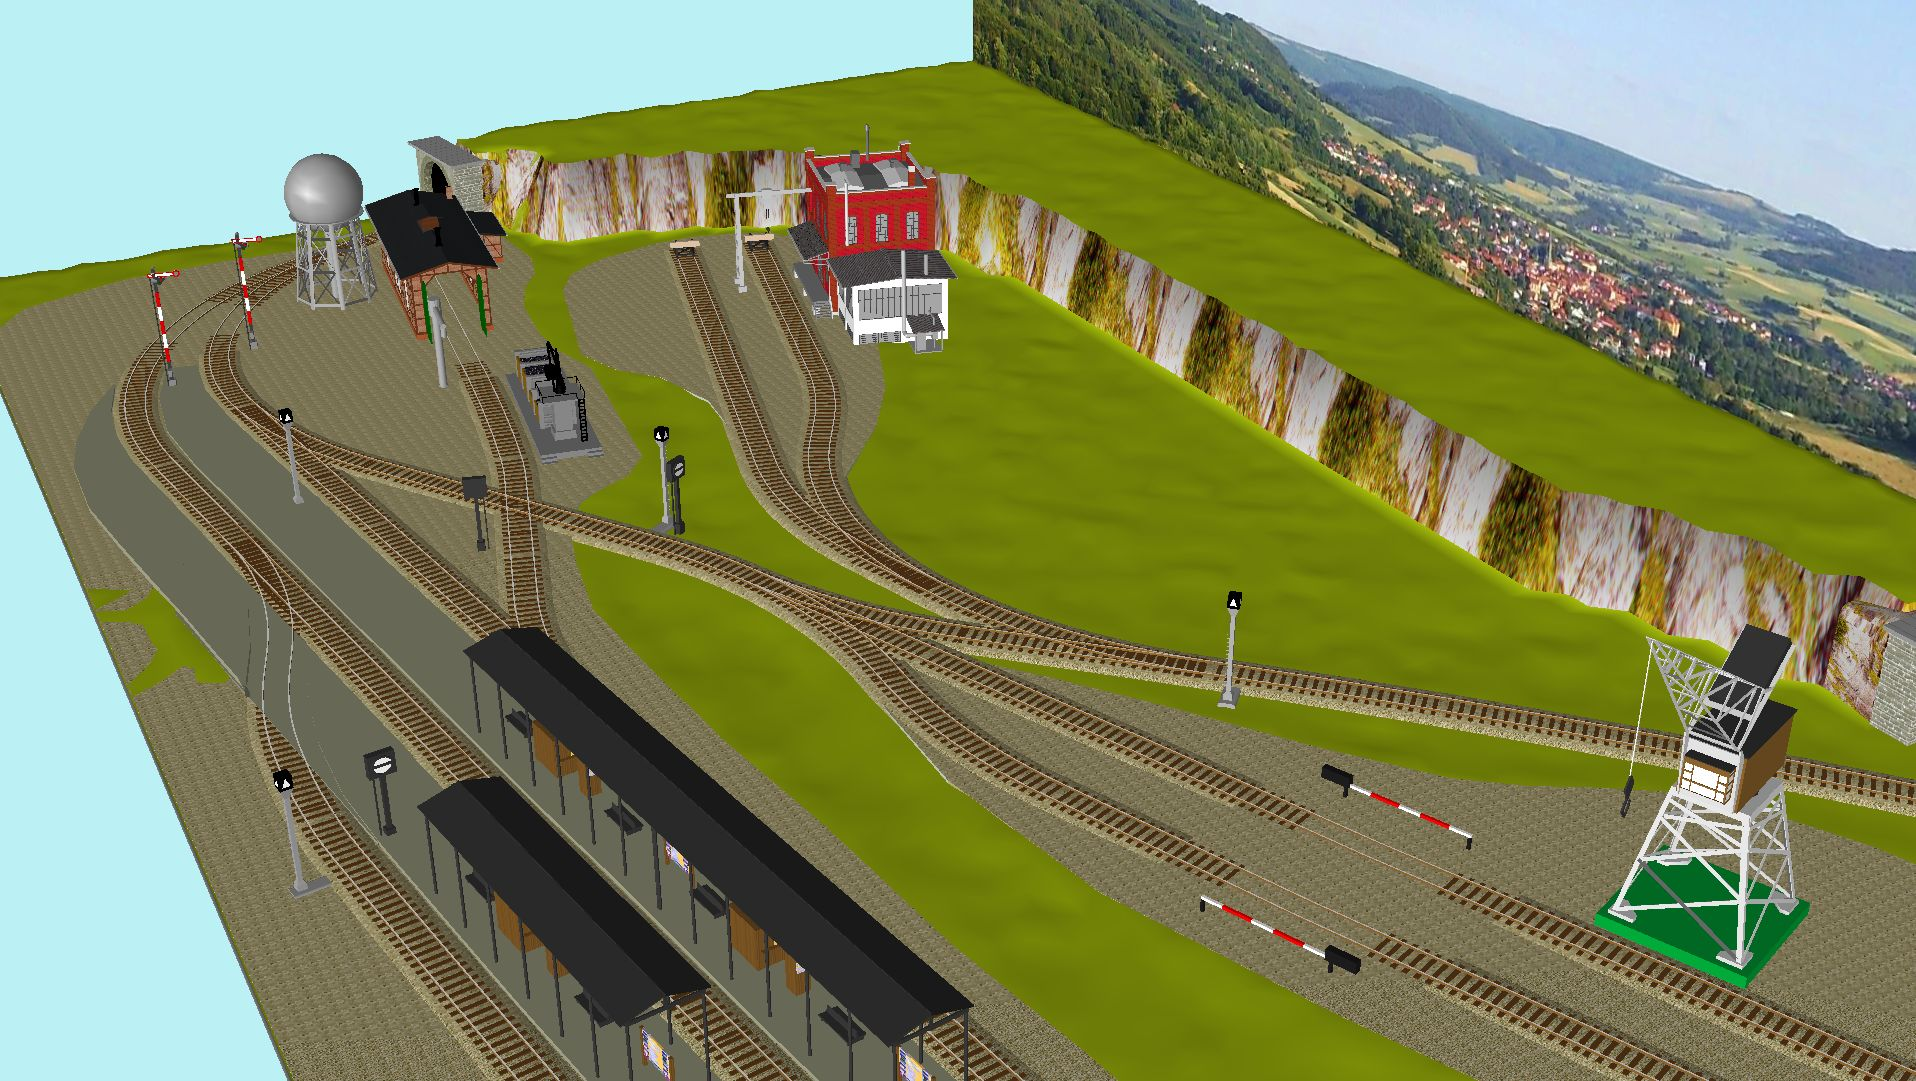 'ALBA Modellbahnpraxis' Band 1, Plan 5 Amp-1_5_m-gleis_jrg_avfjwo